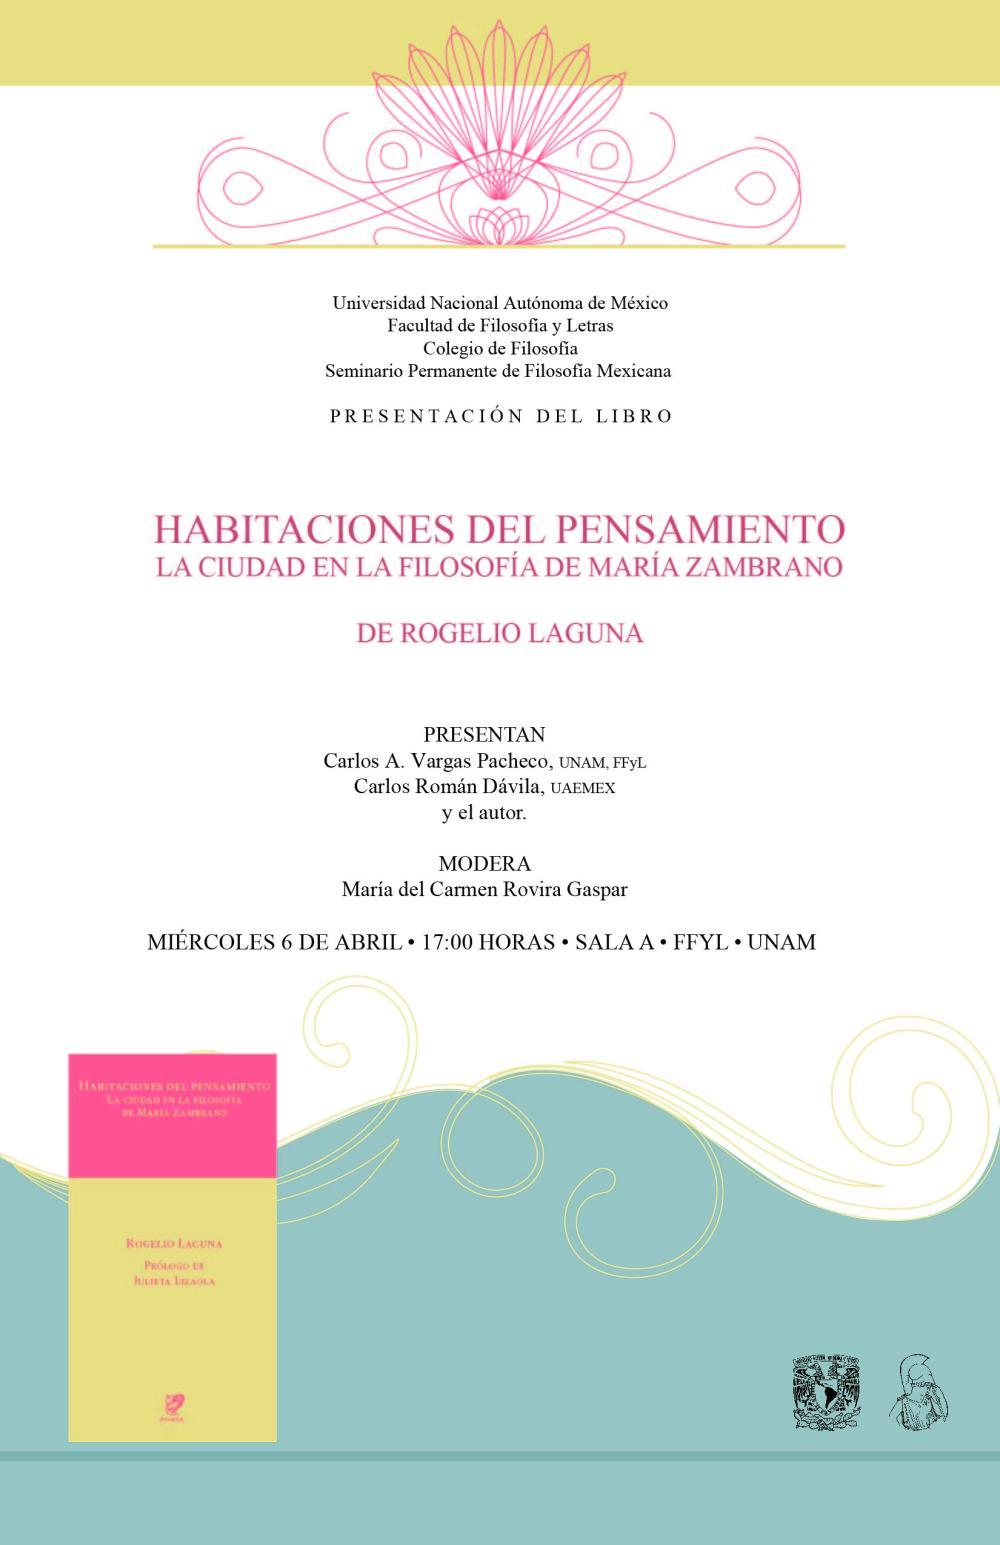 presentación-del-libro-maria-zambrano-01.jpg